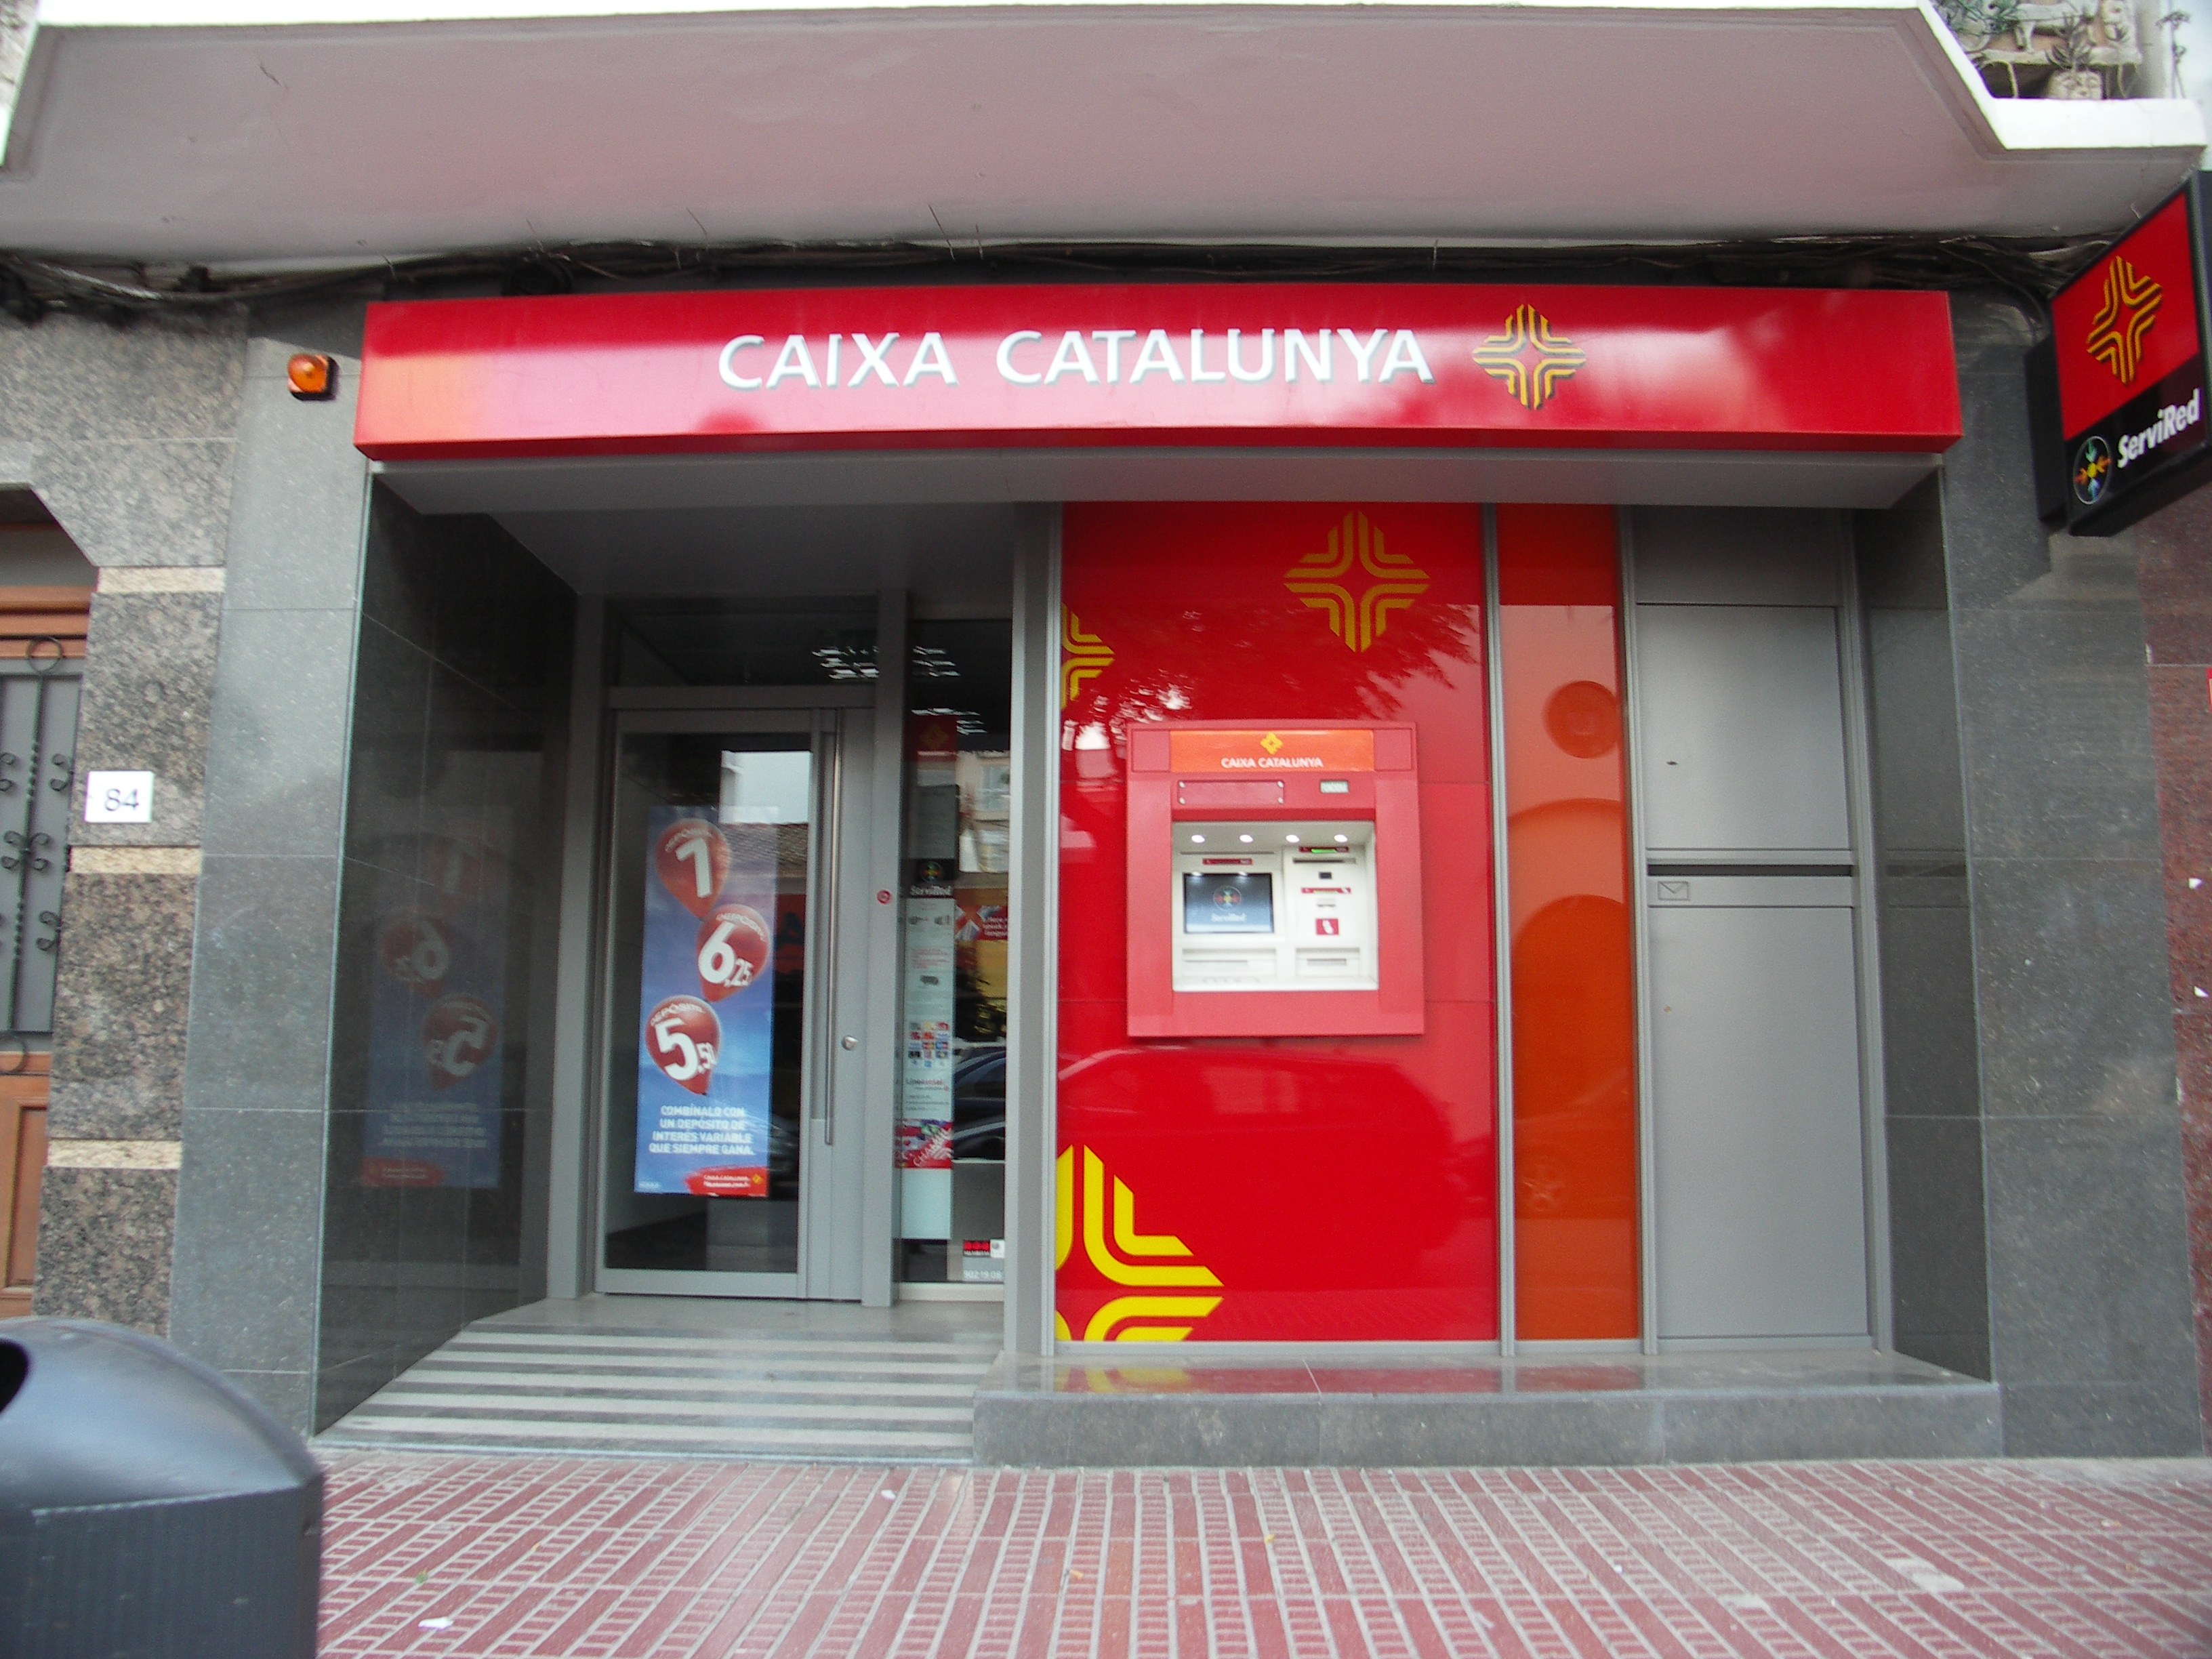 Caixa_Catalunya_branch_on_Ibiza